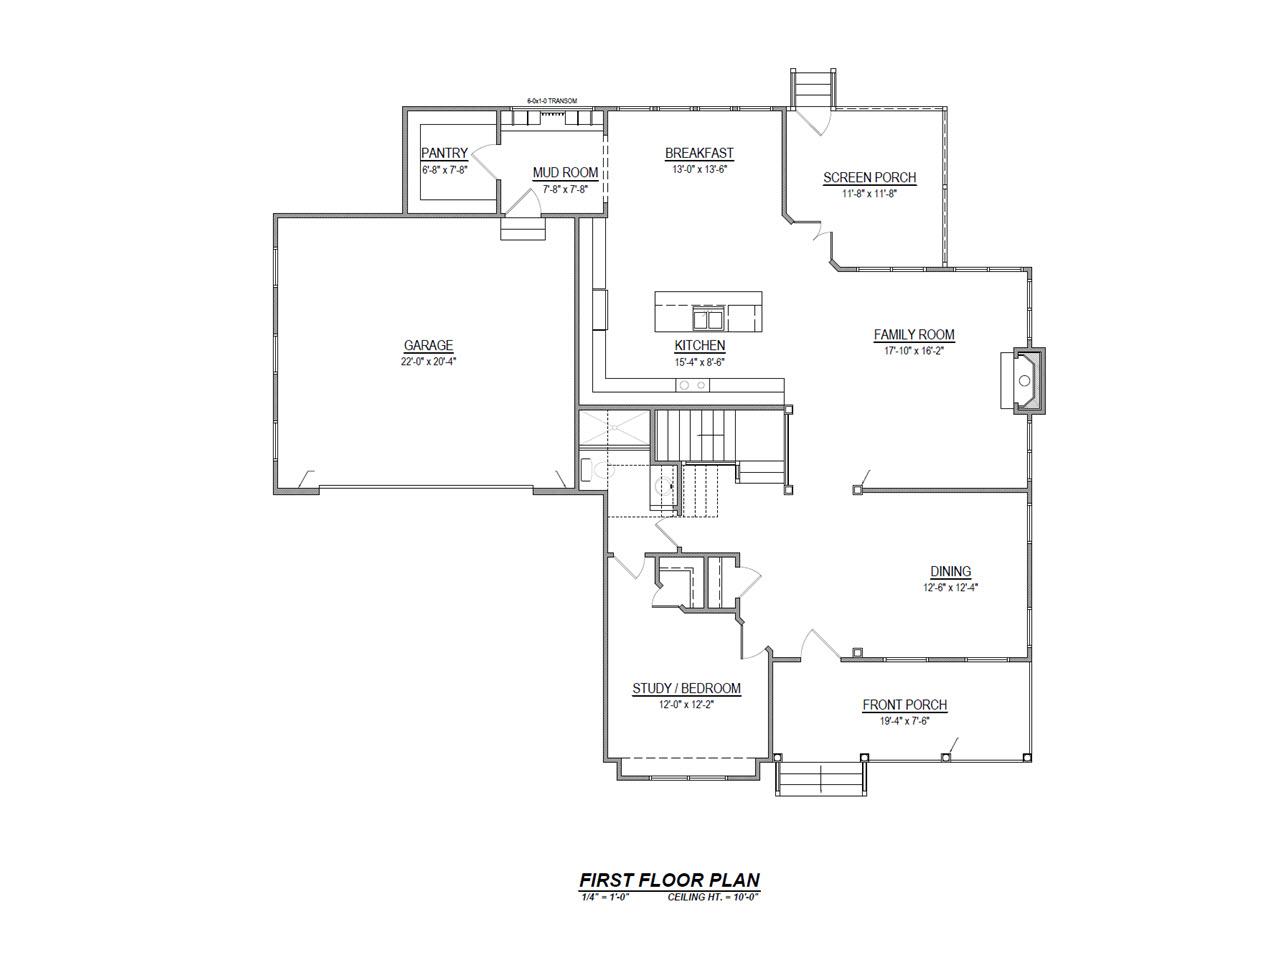 lot 53 first floor plan.jpg